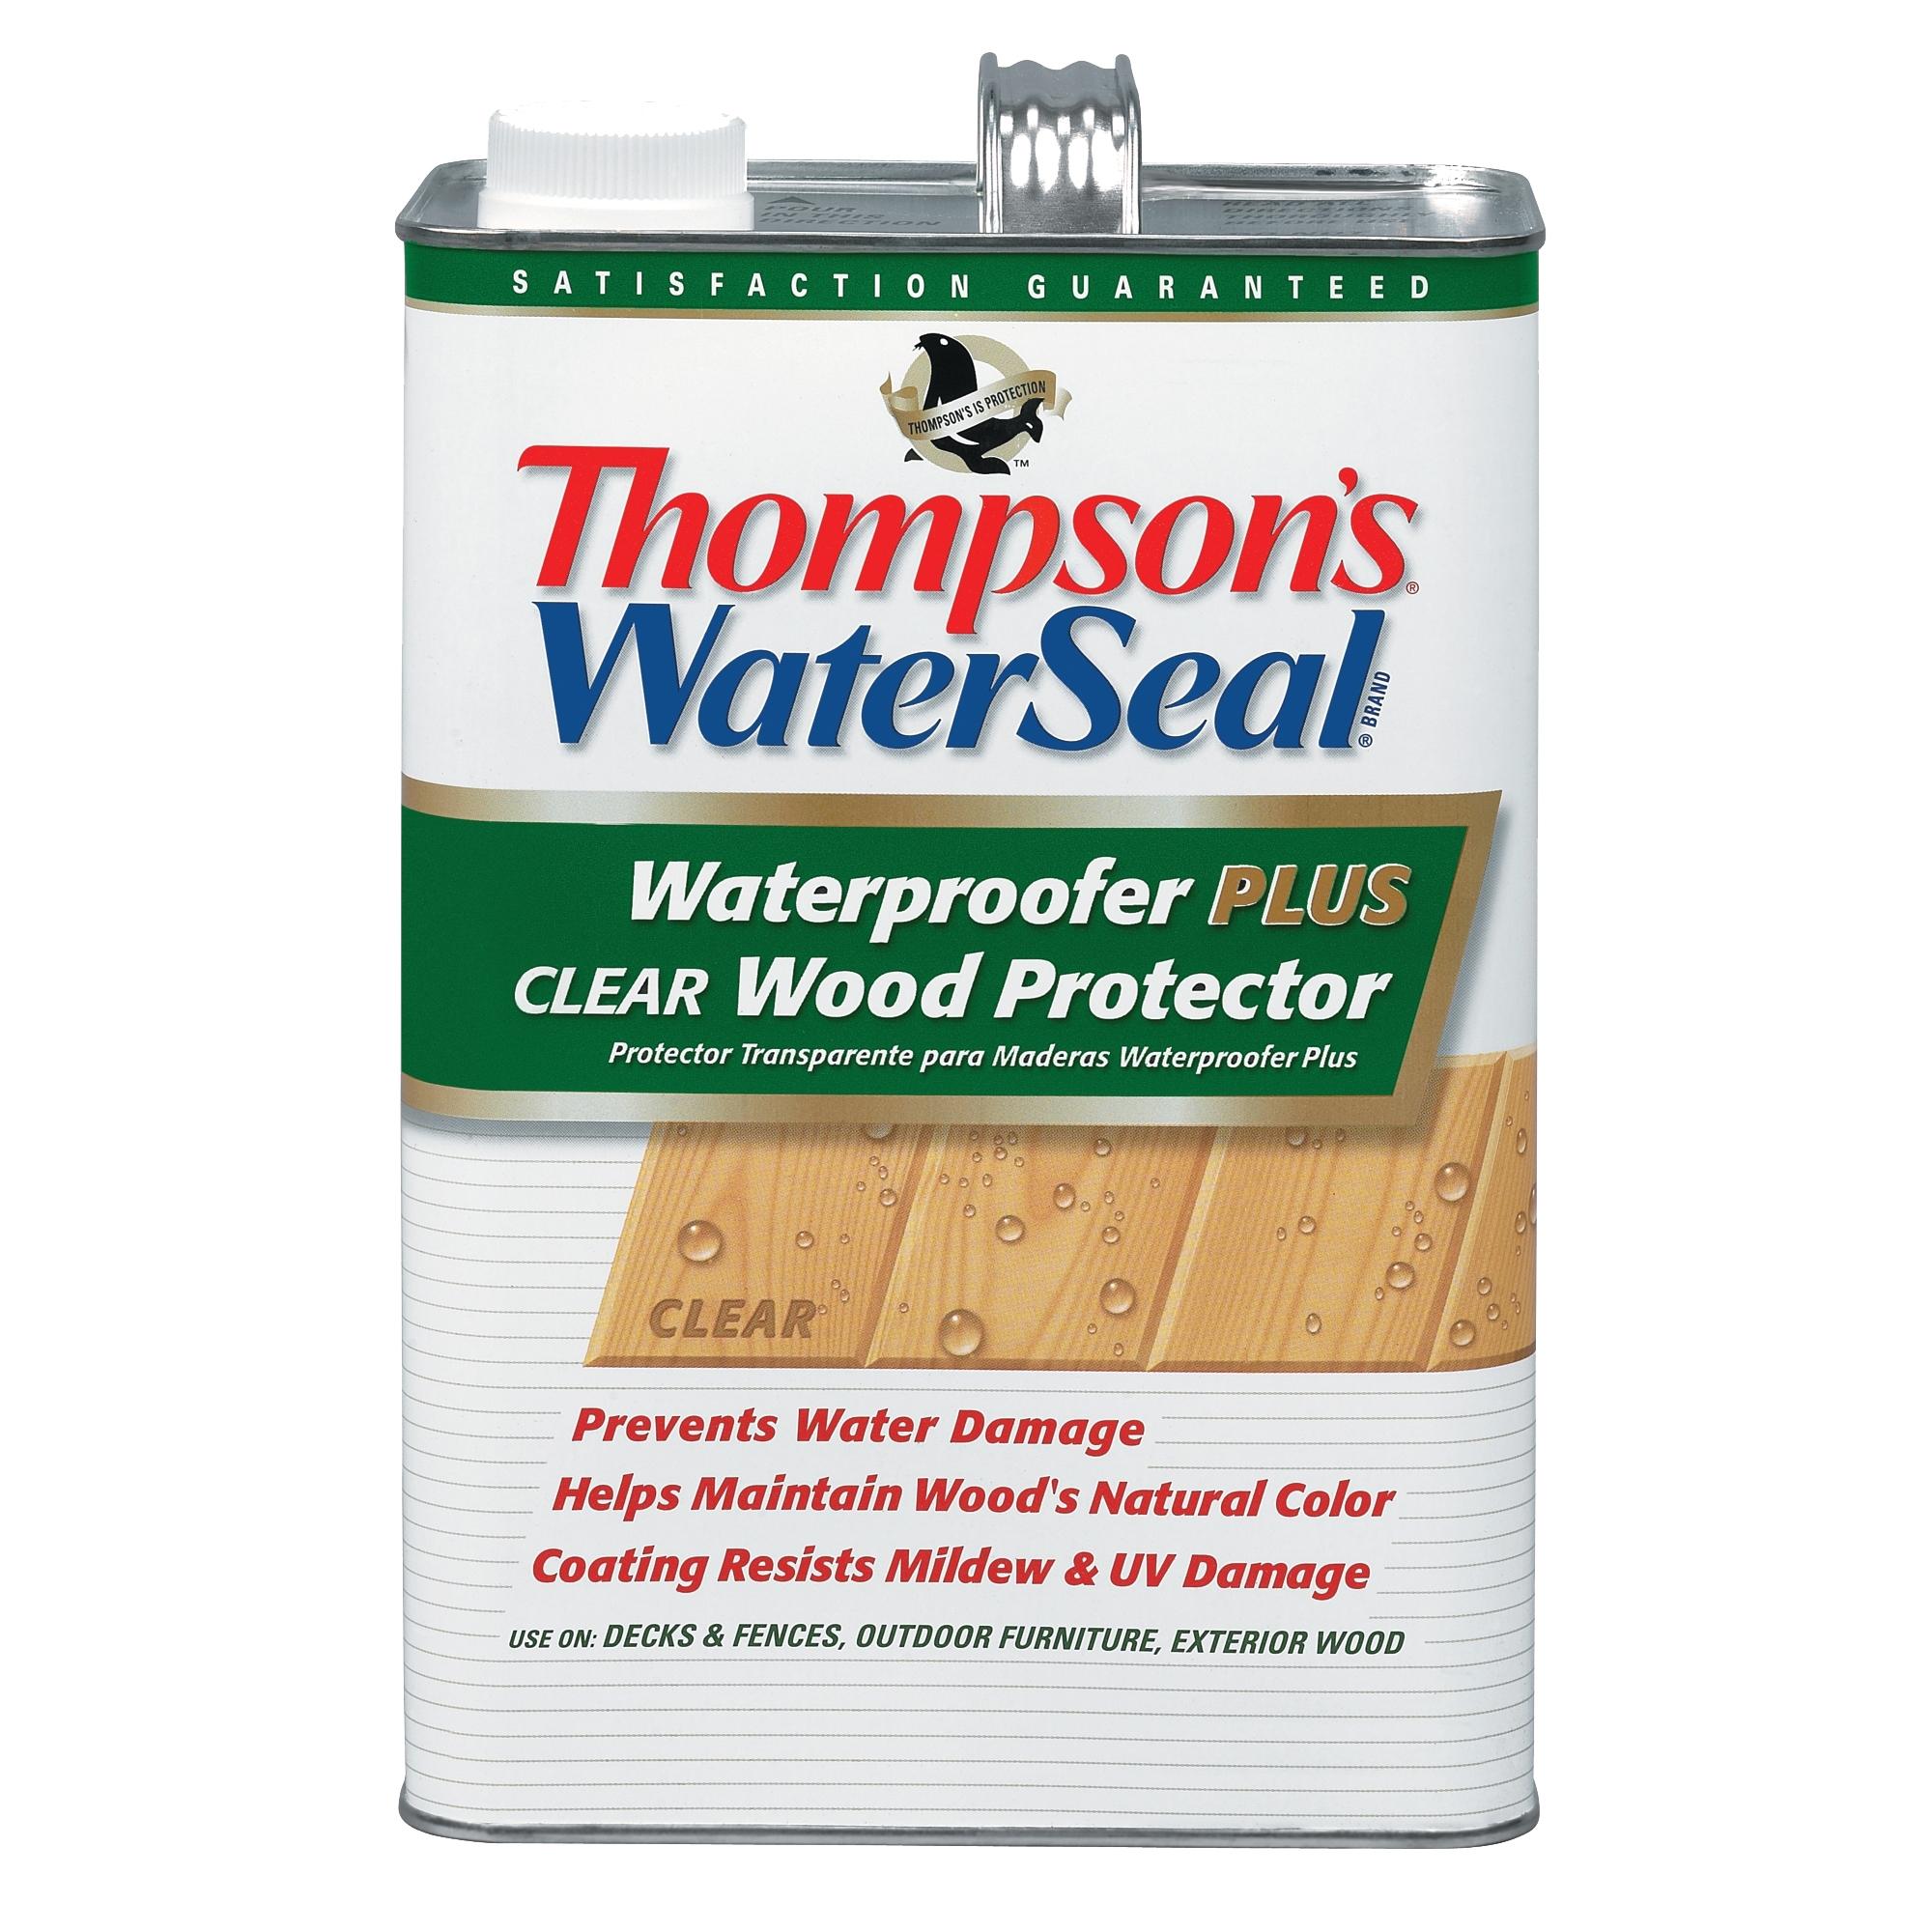 Thompson's Waterseal Waterproofer Plus Clear Wood Protector, Low VOC, Gal